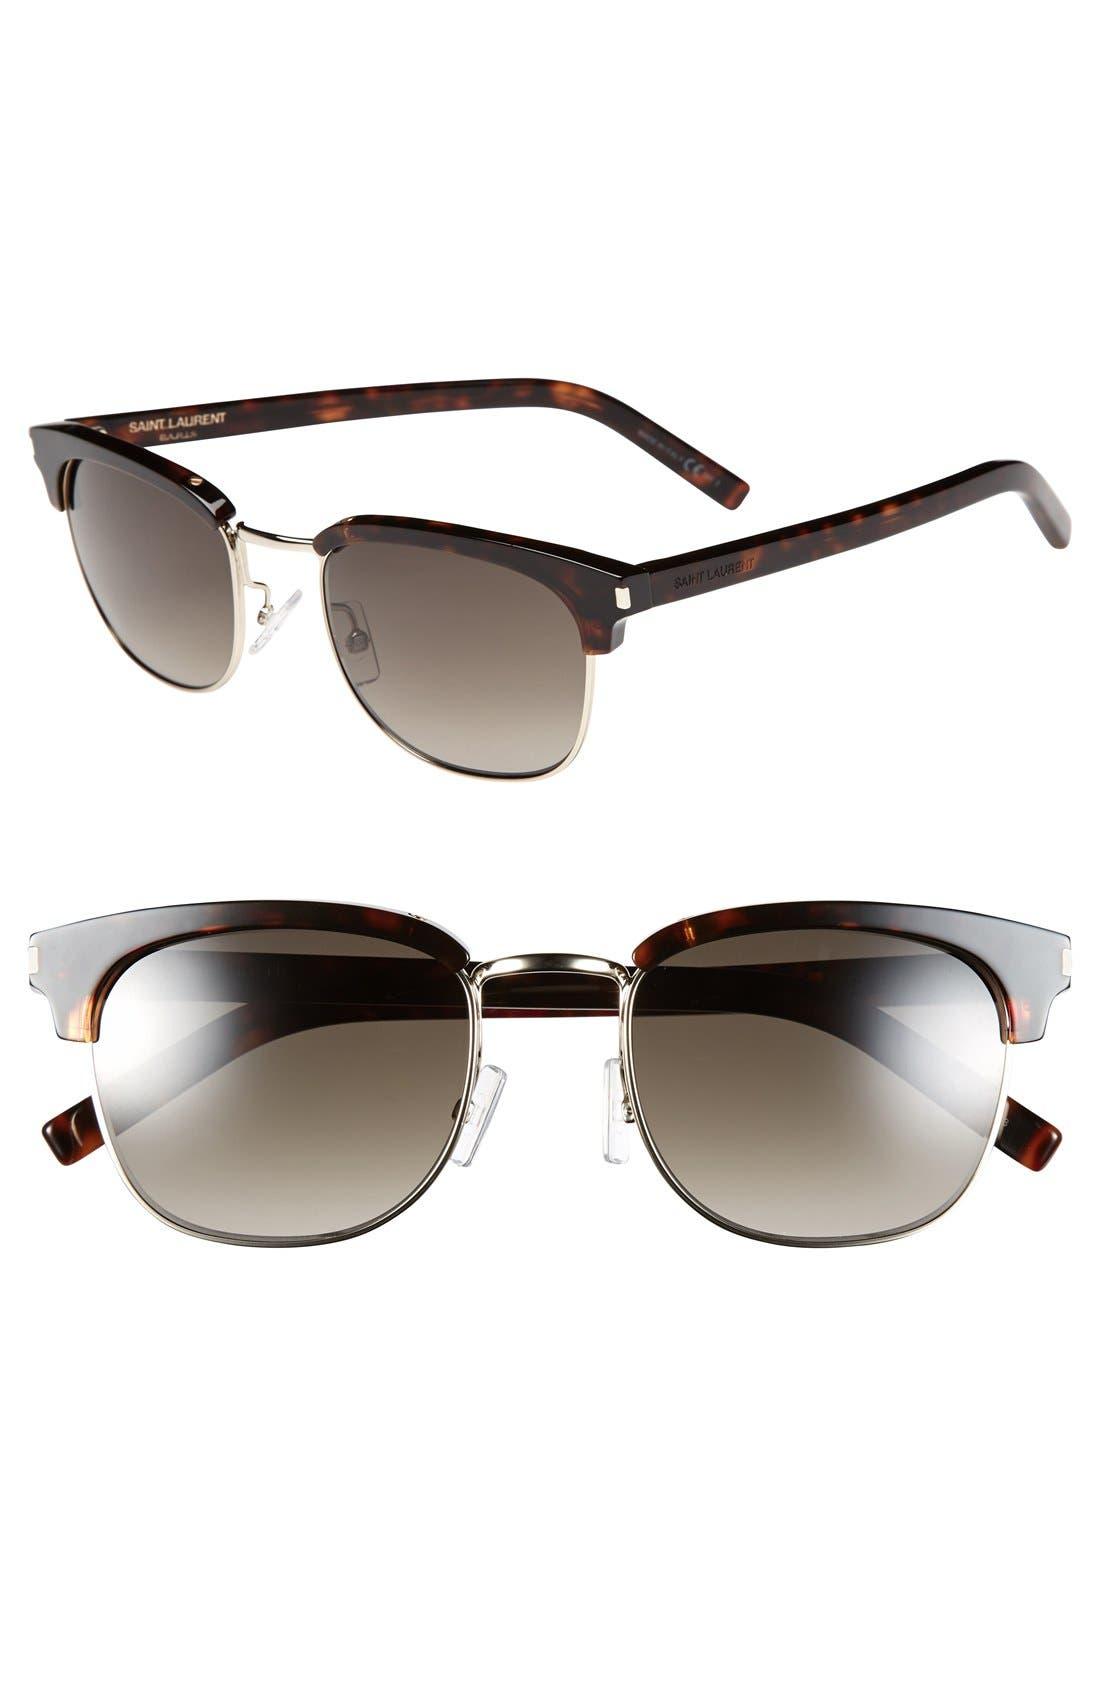 Alternate Image 1 Selected - Saint Laurent 52mm Retro Sunglasses